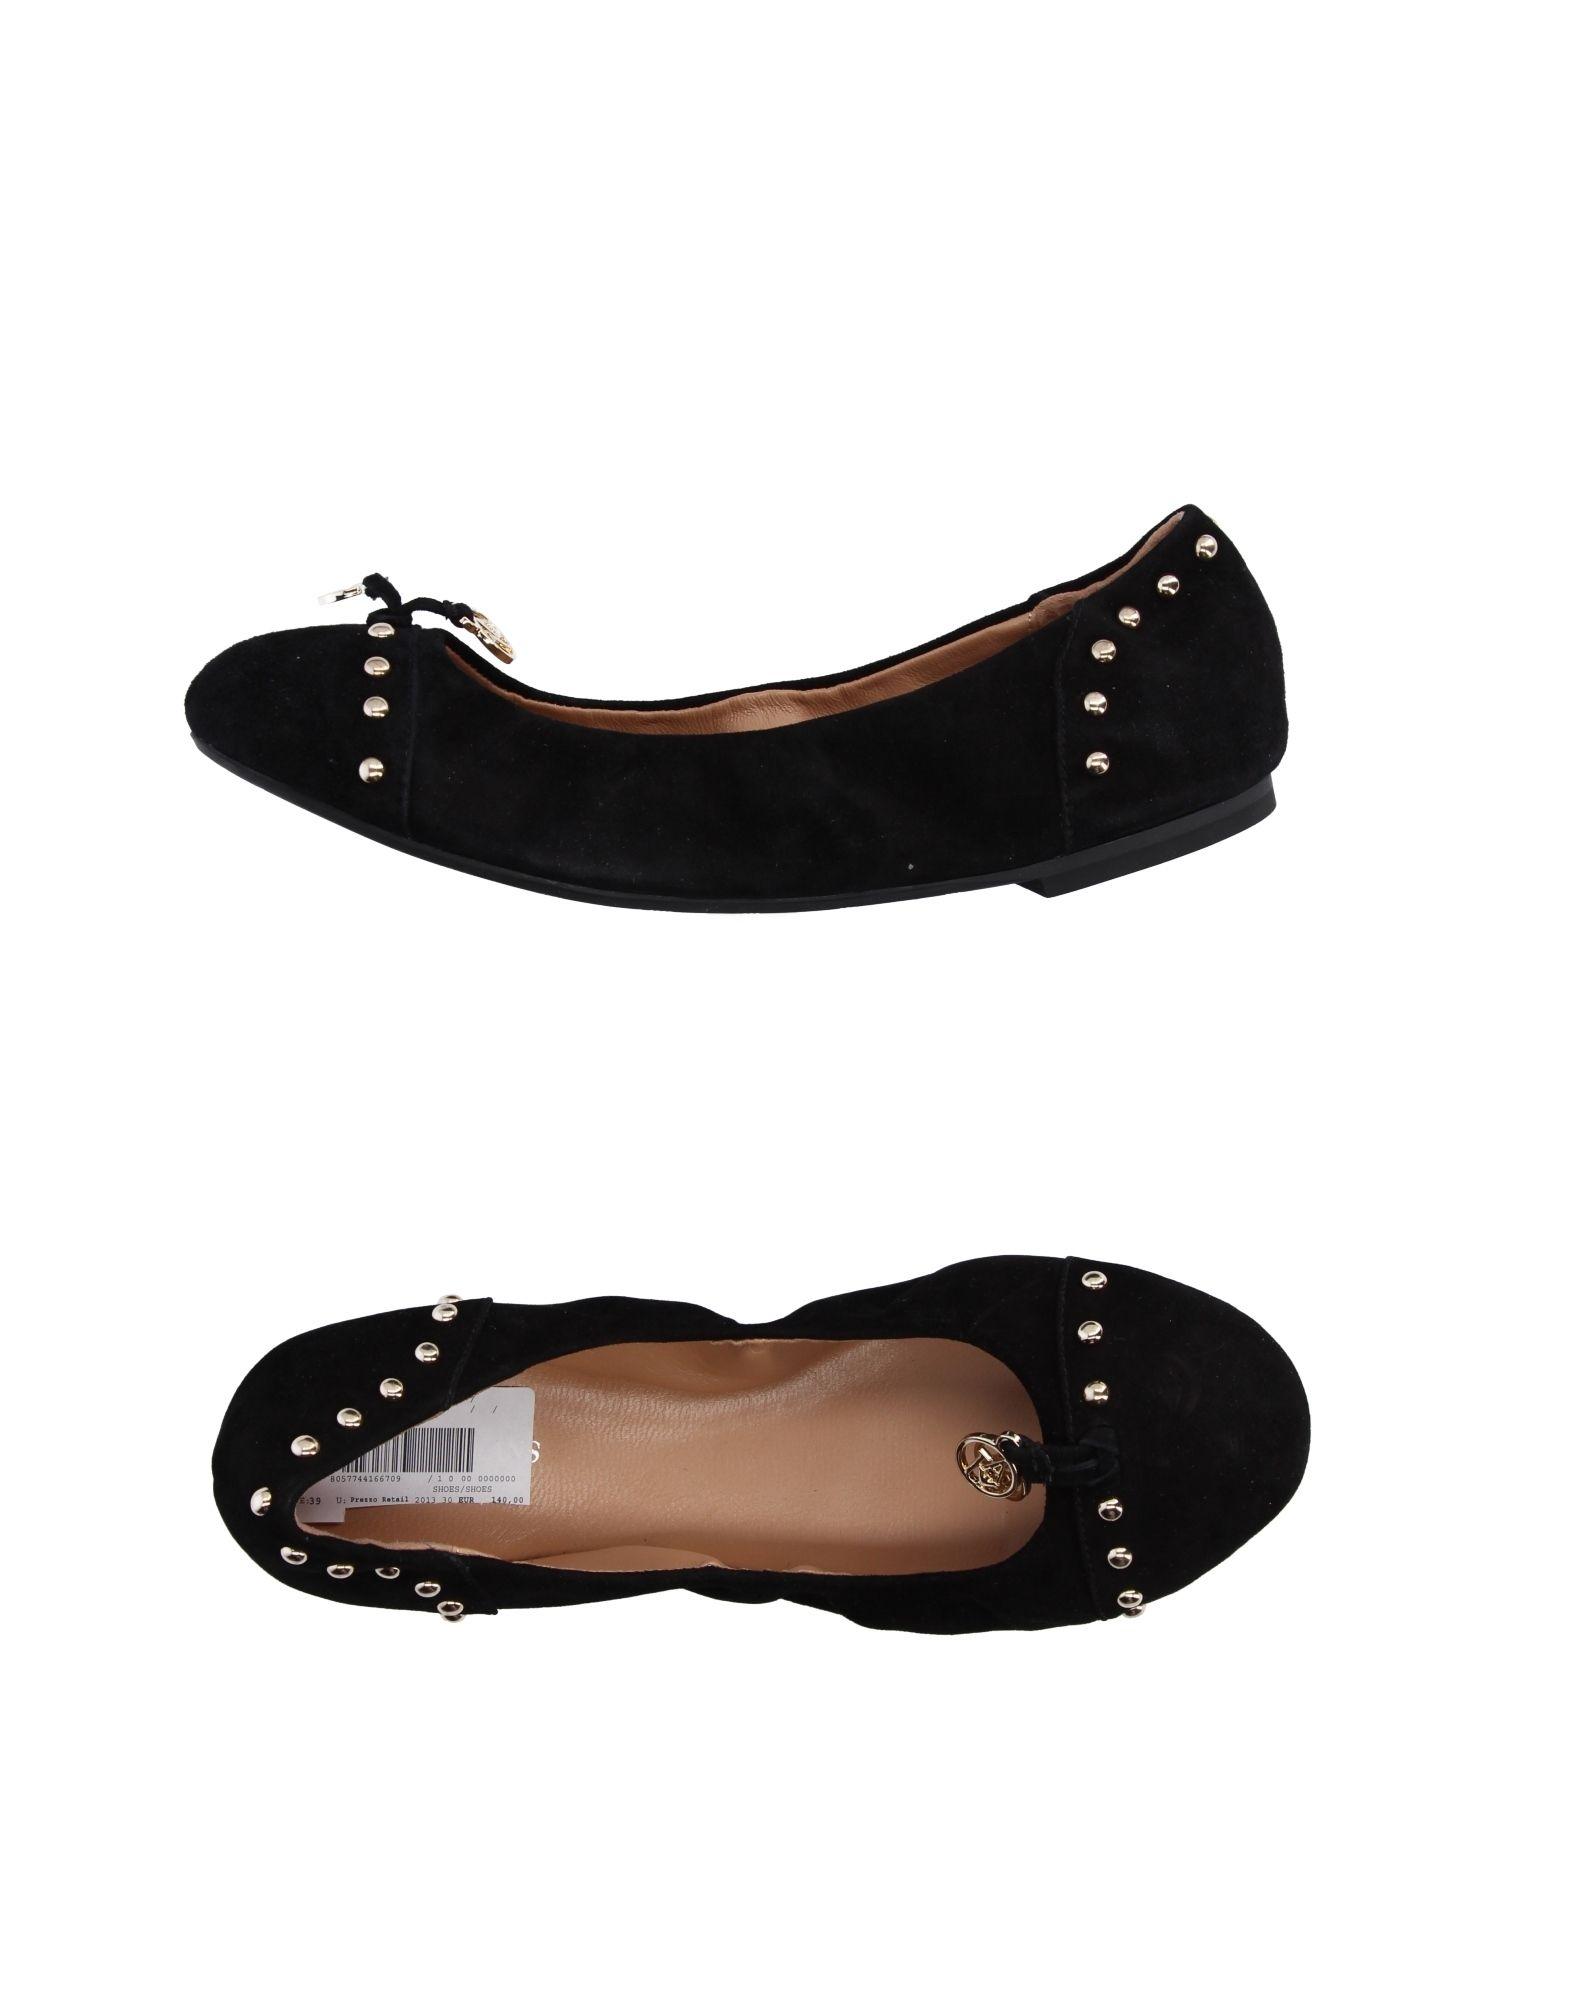 Ballerine Armani Jeans donna donna - 11210512TG